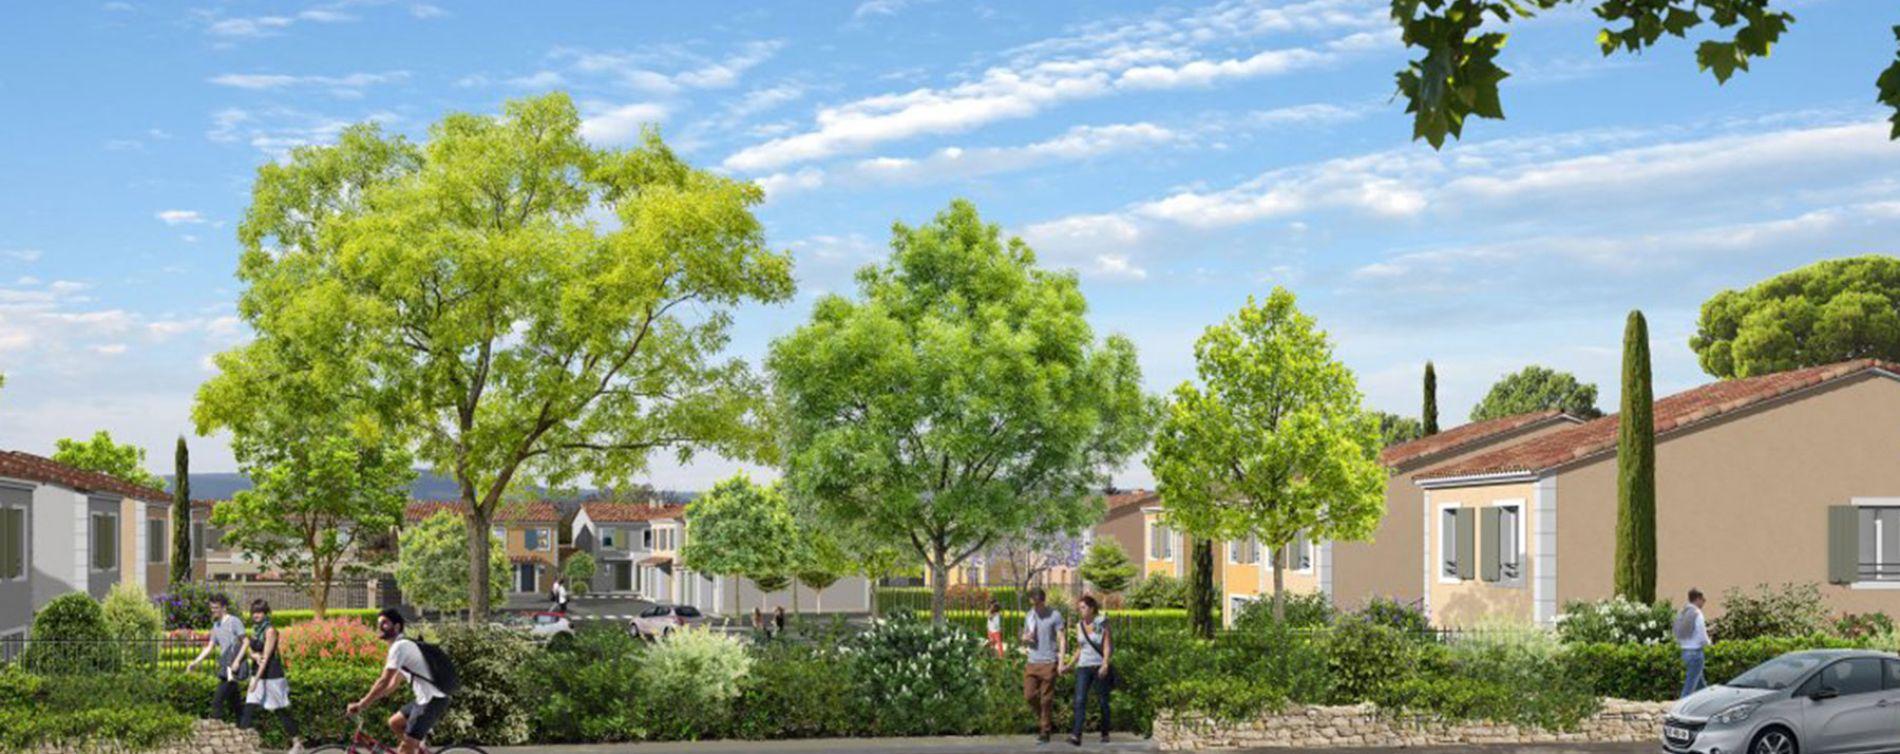 Pertuis : programme immobilier neuve « Luberance » (3)